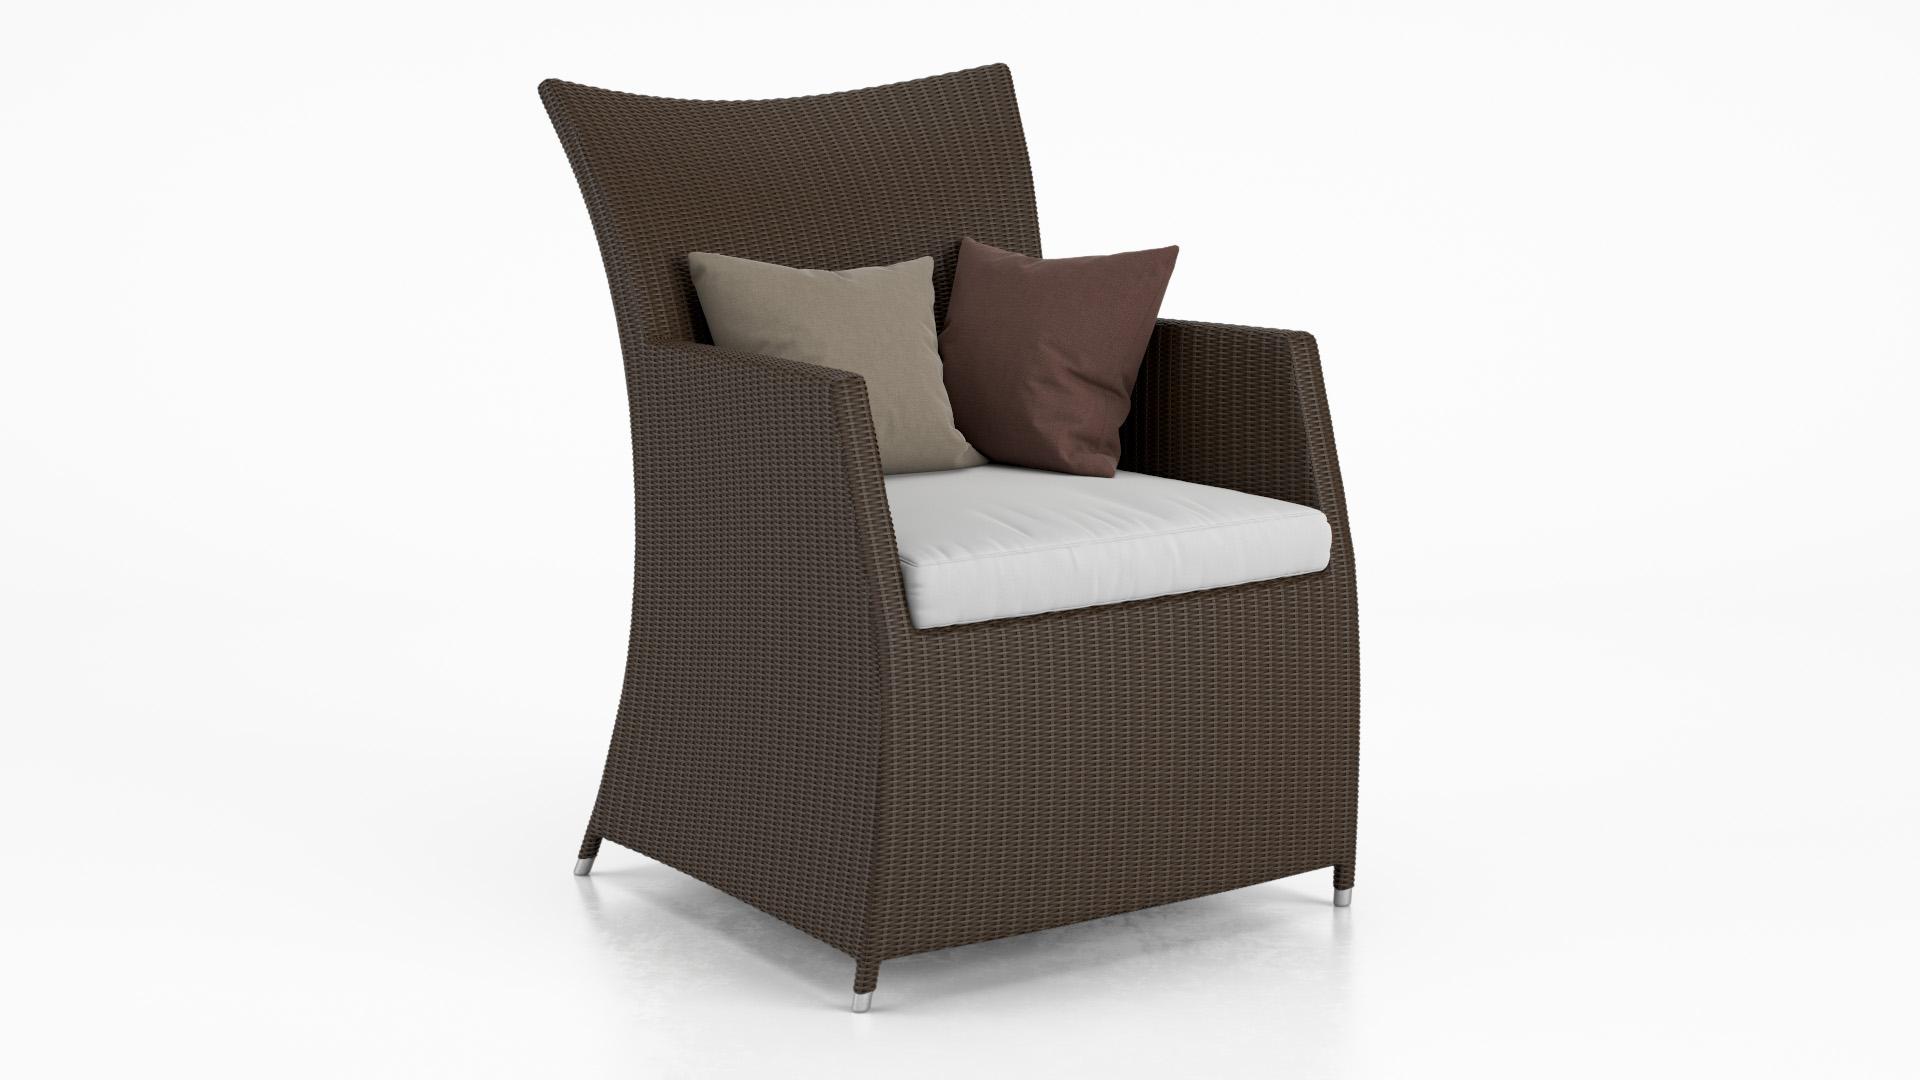 U-zit_Chair_CF-21-DB_WhiteSet_01_0000